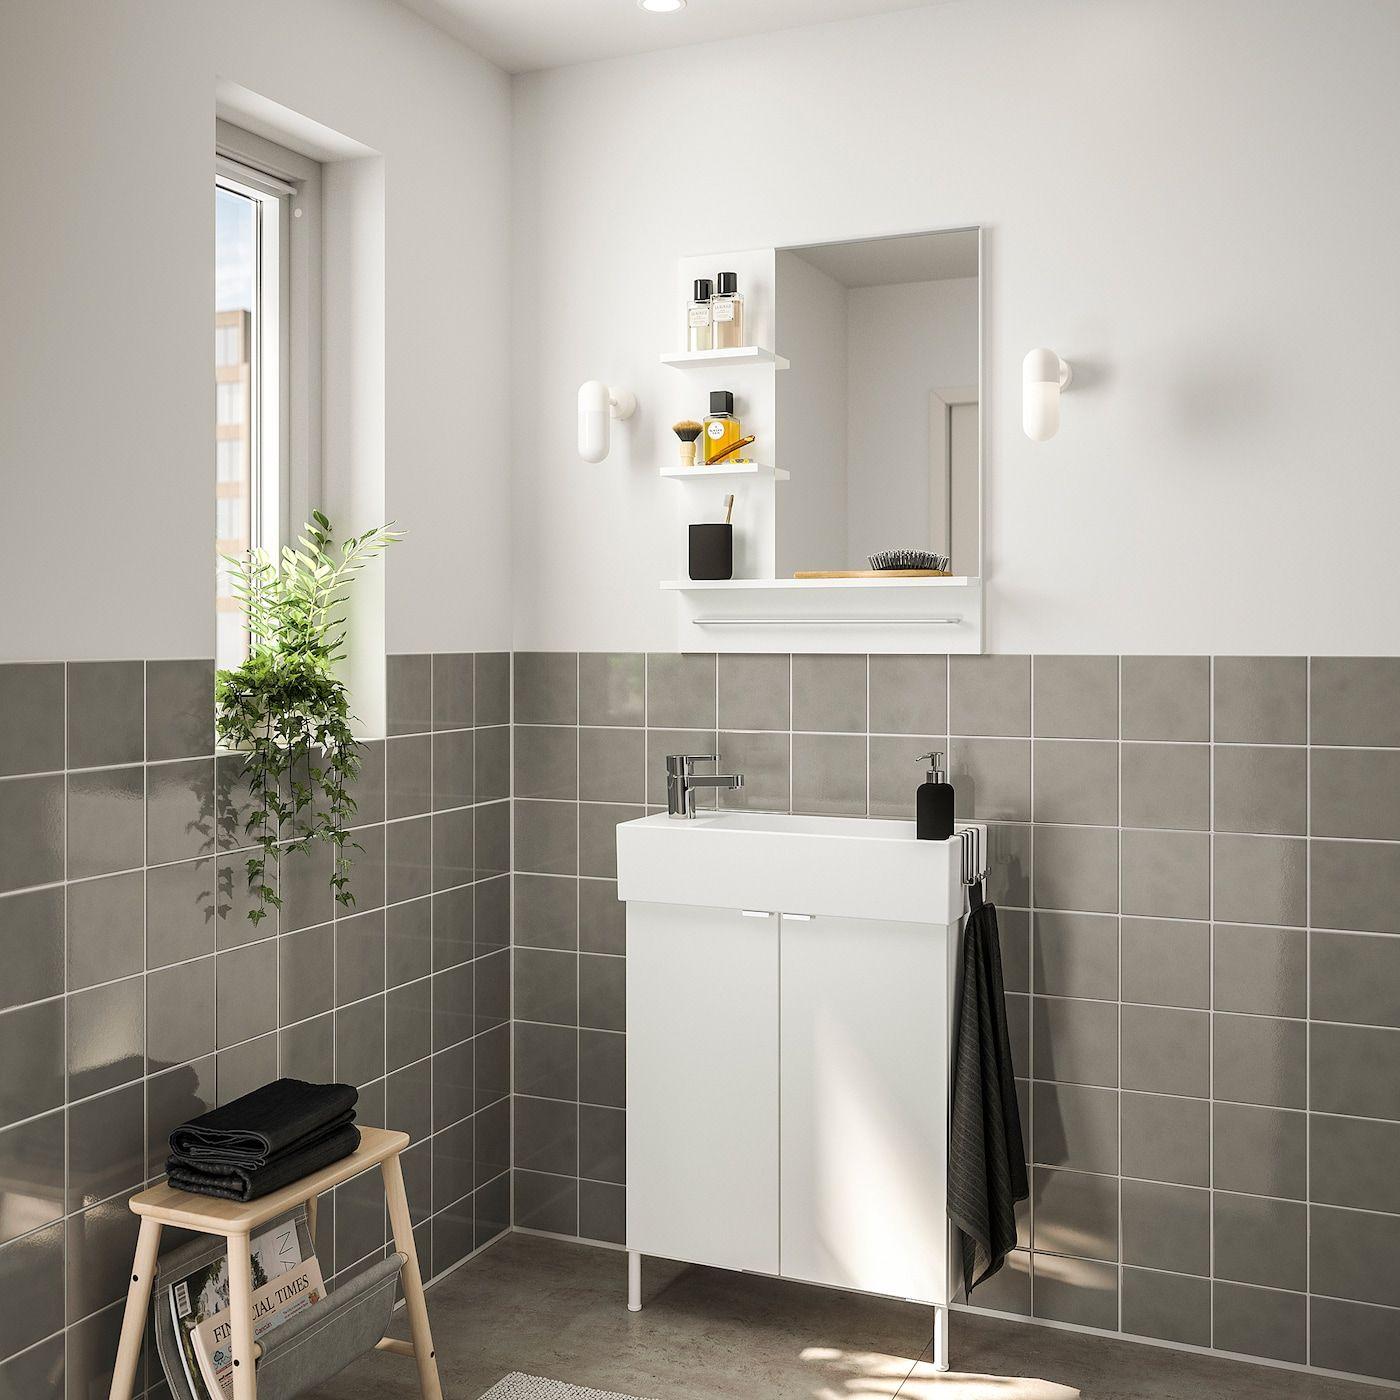 IKEA – LILLÅNGEN / Bathroom furniture, set of 5